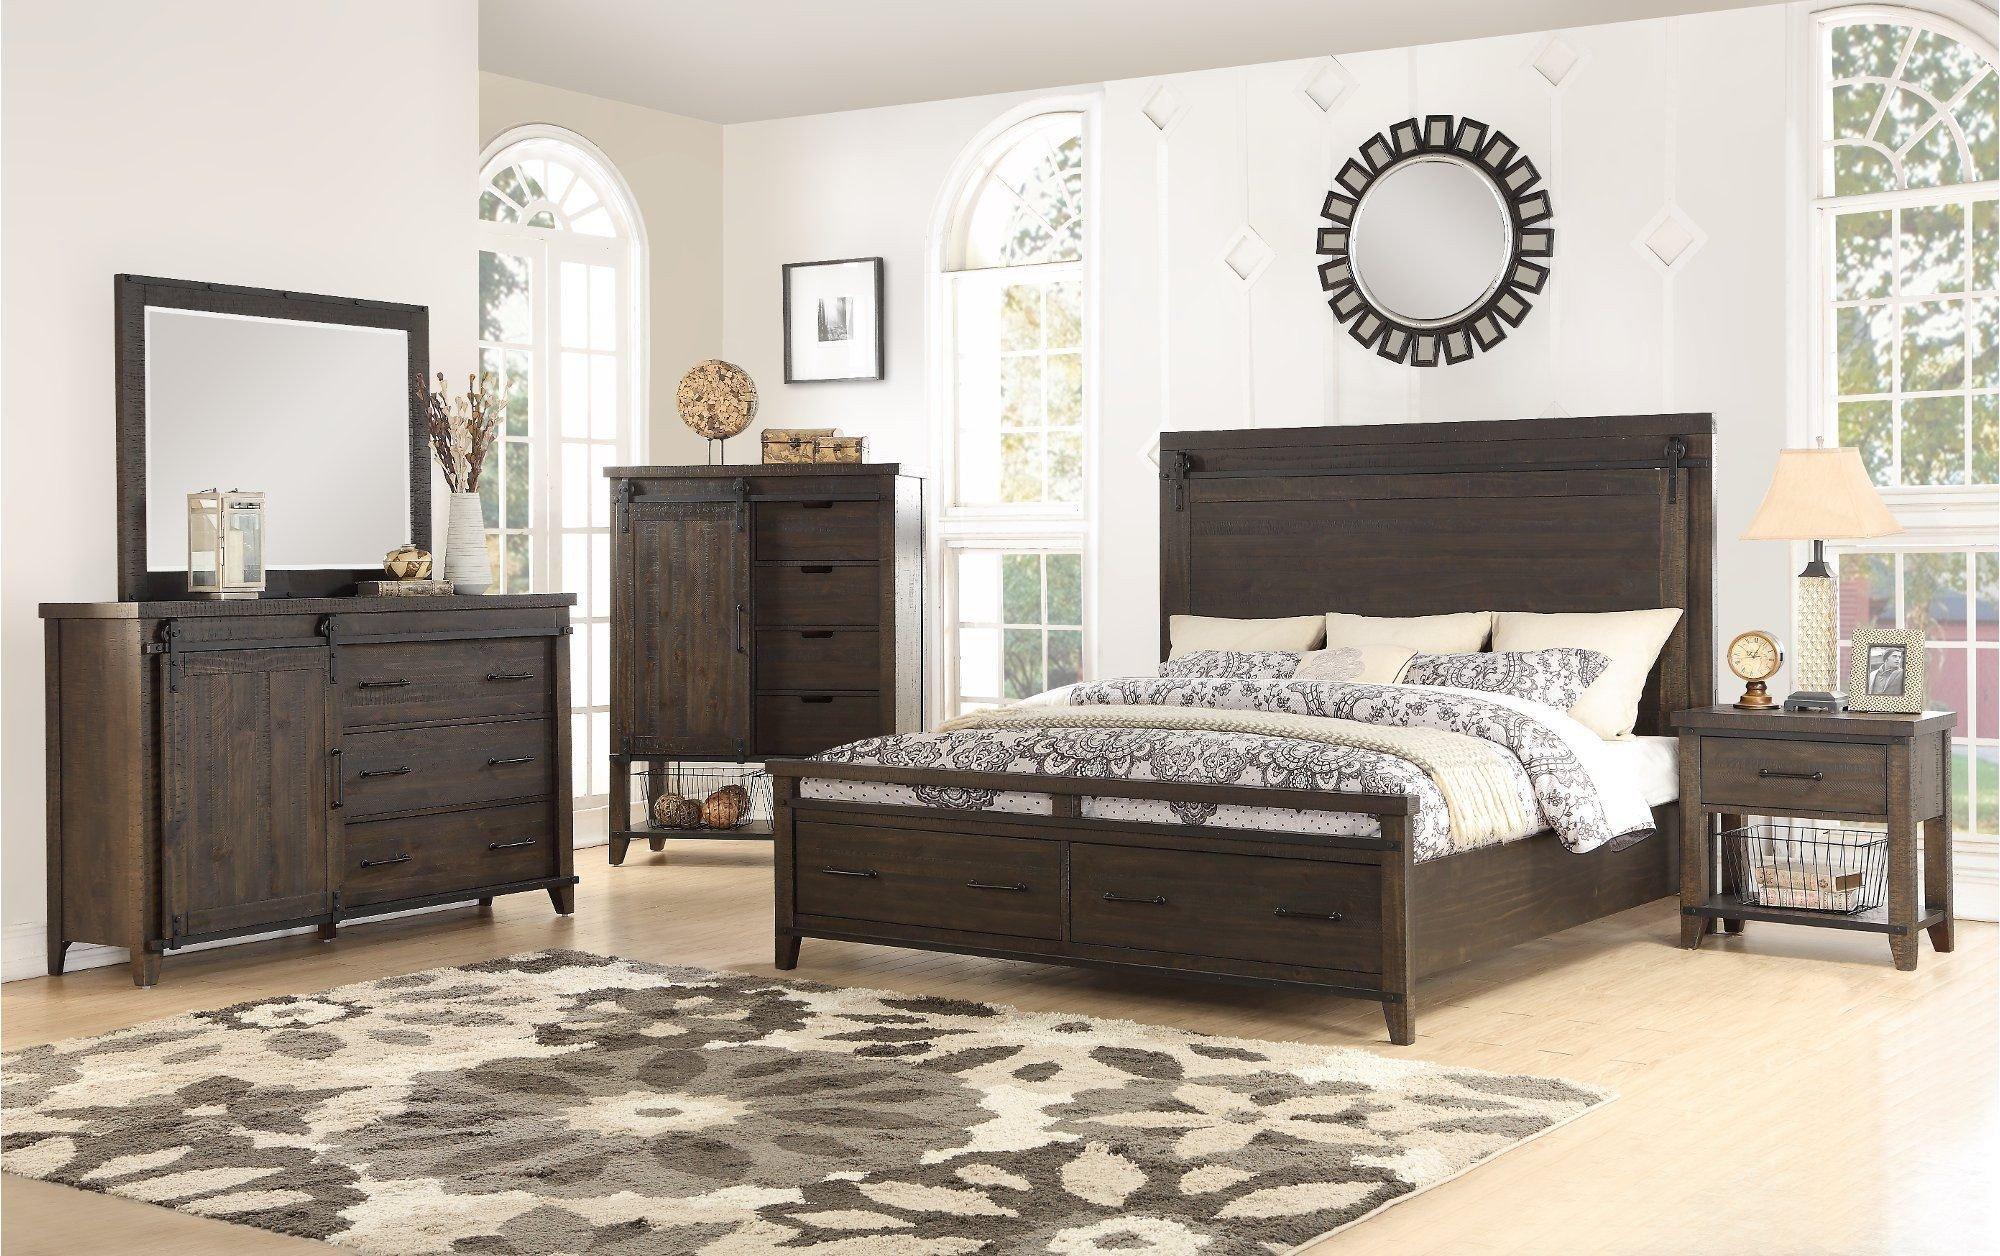 4 Piece Bedroom Set Luxury Rustic Contemporary Brown 4 Piece King Bedroom Set Montana